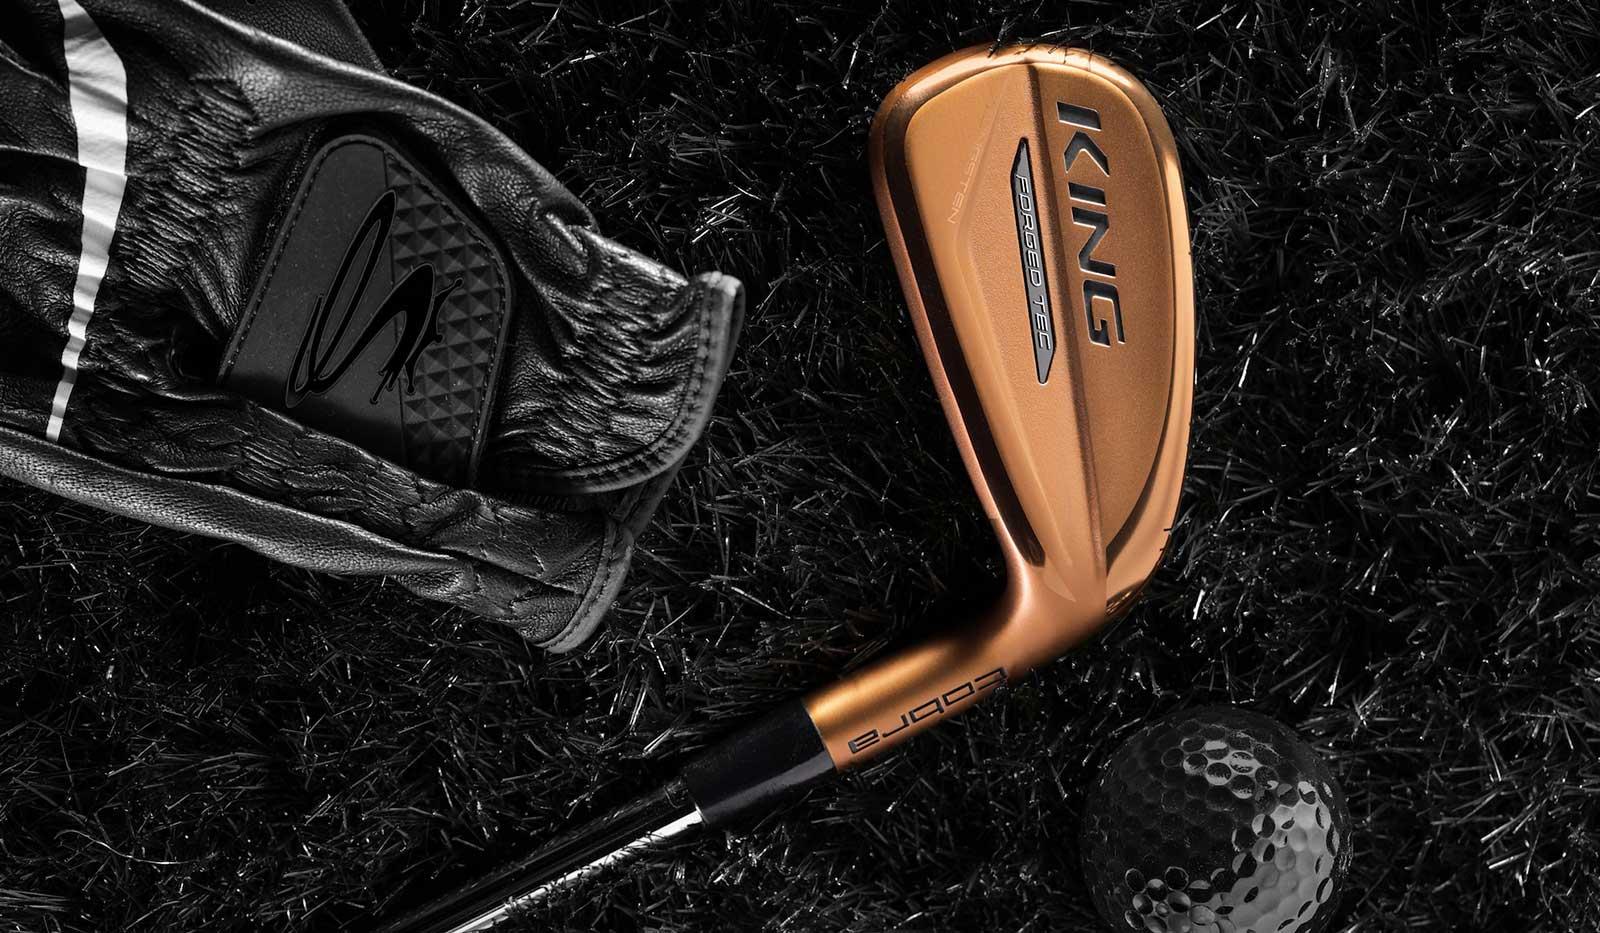 COBRA Golf KING Forged TEC Copper Eisen